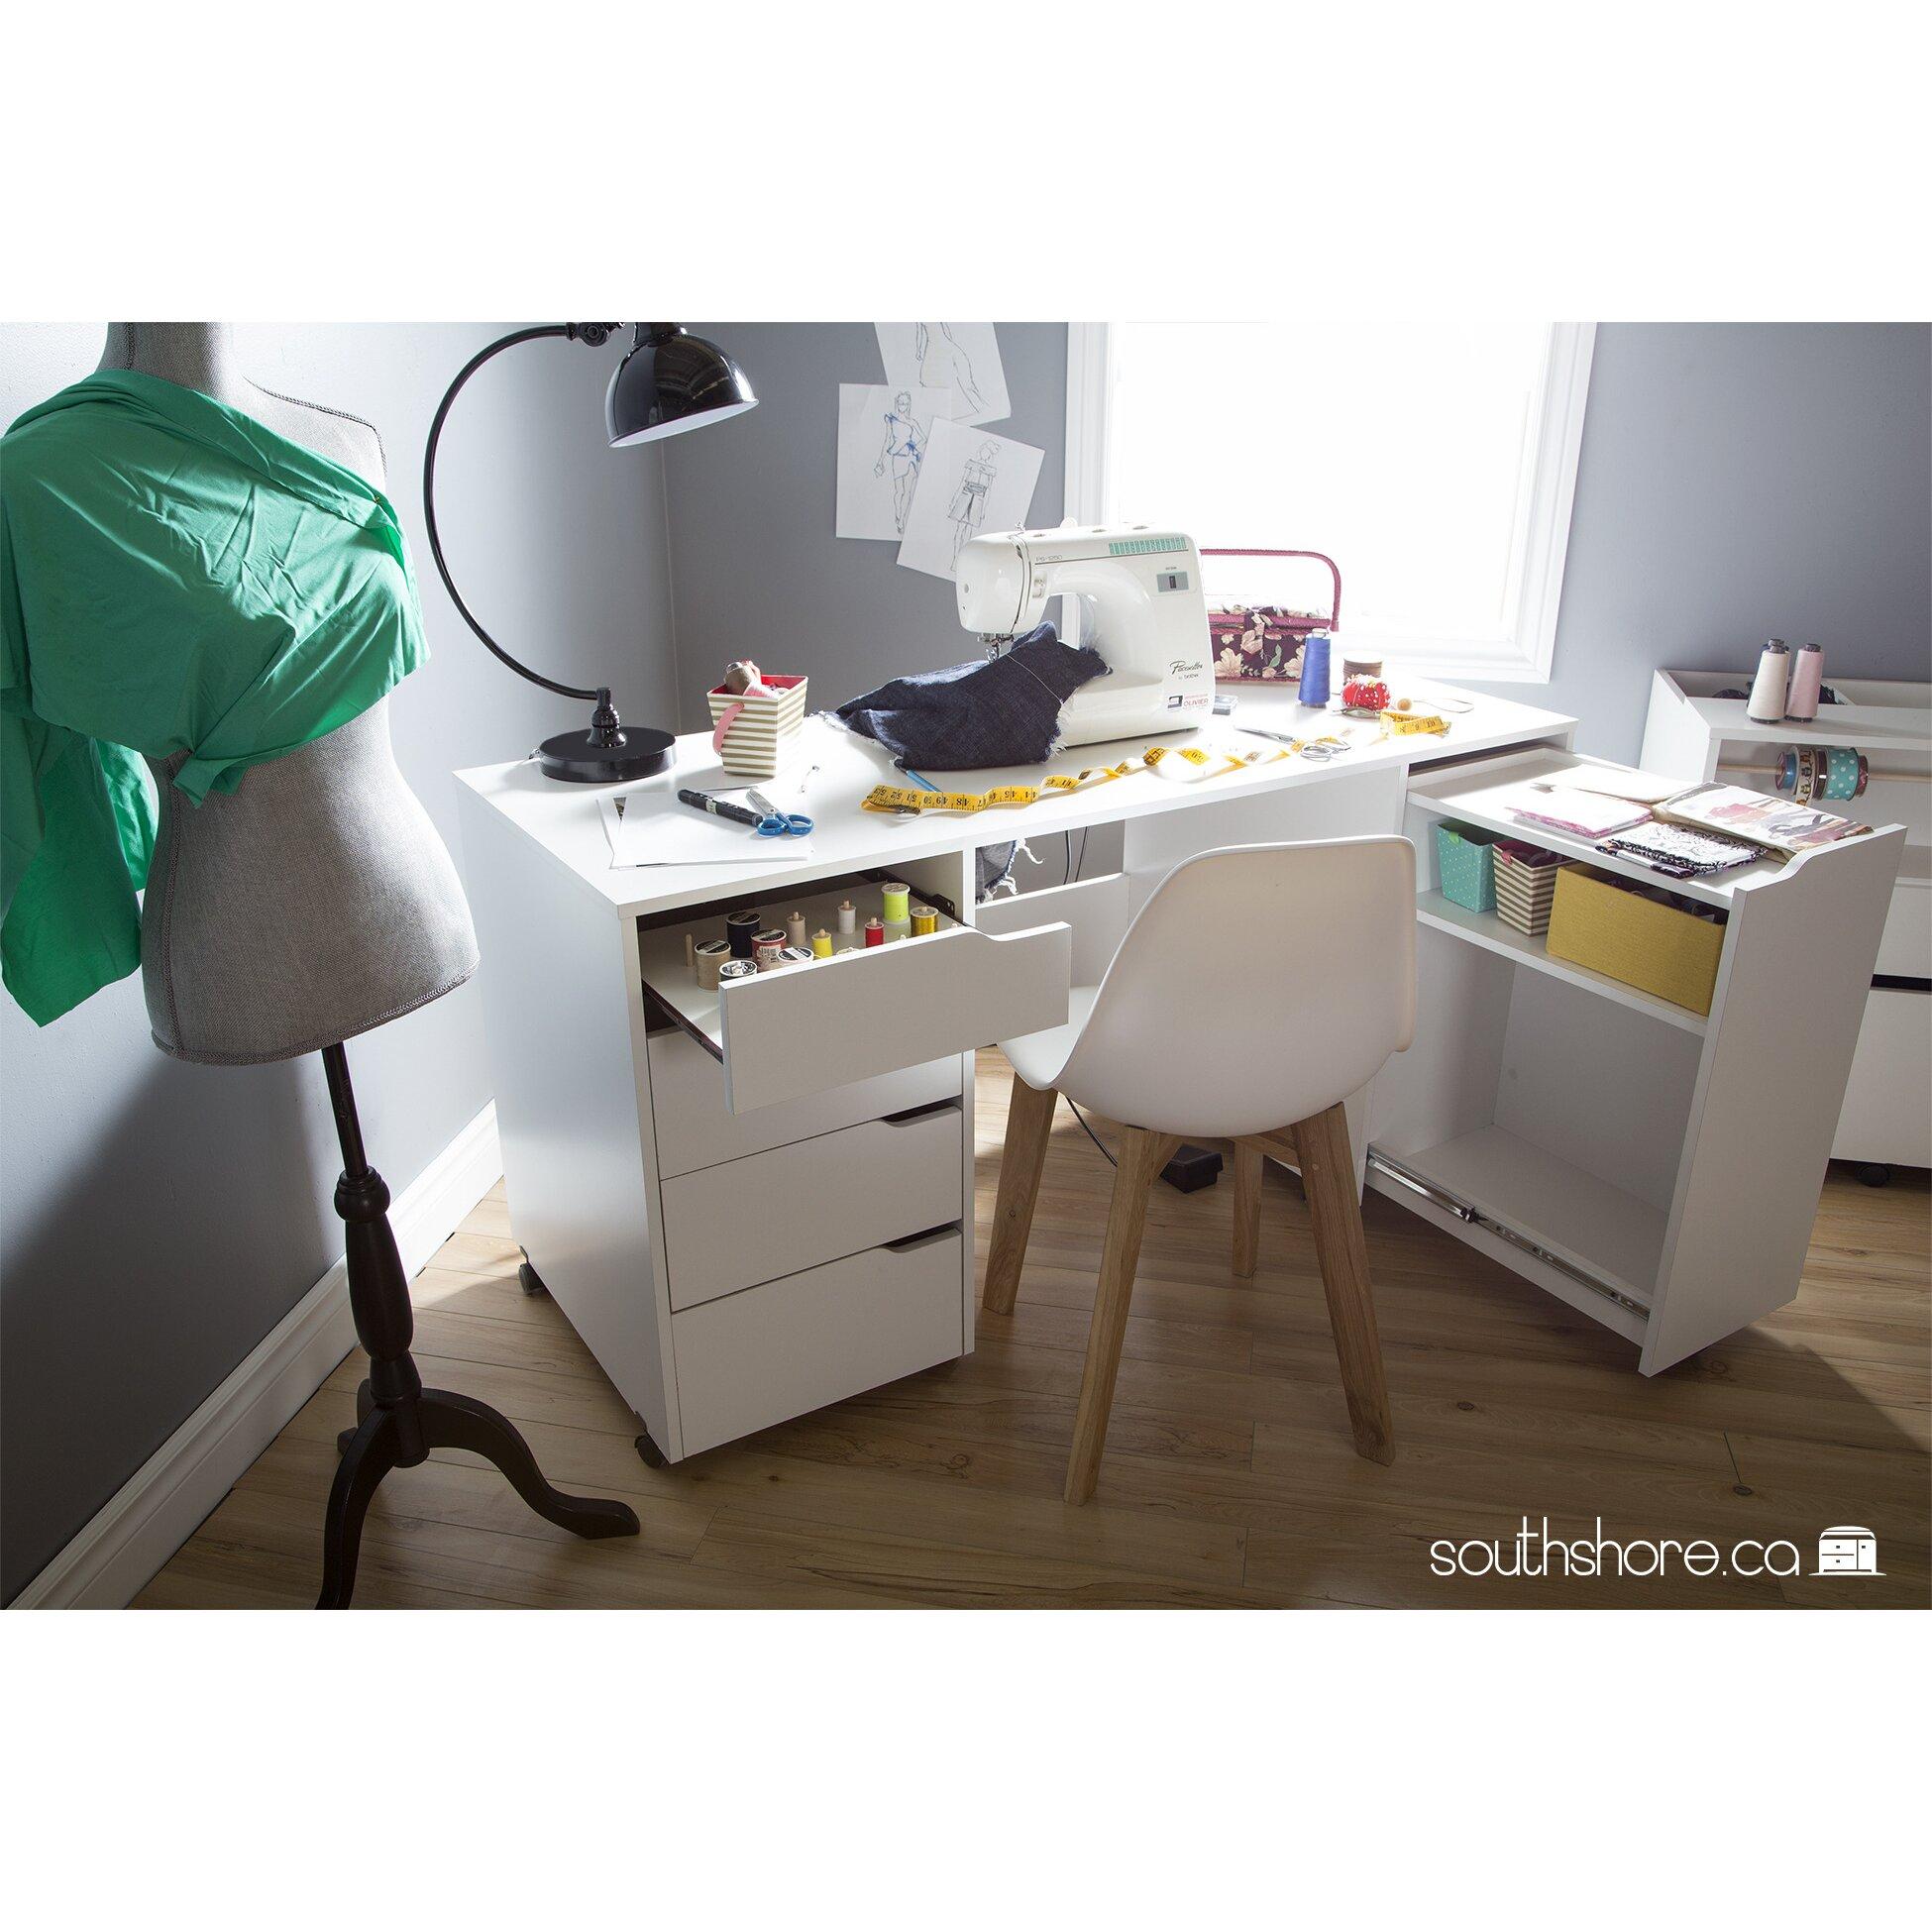 south shore crea w x d sewing table. Black Bedroom Furniture Sets. Home Design Ideas